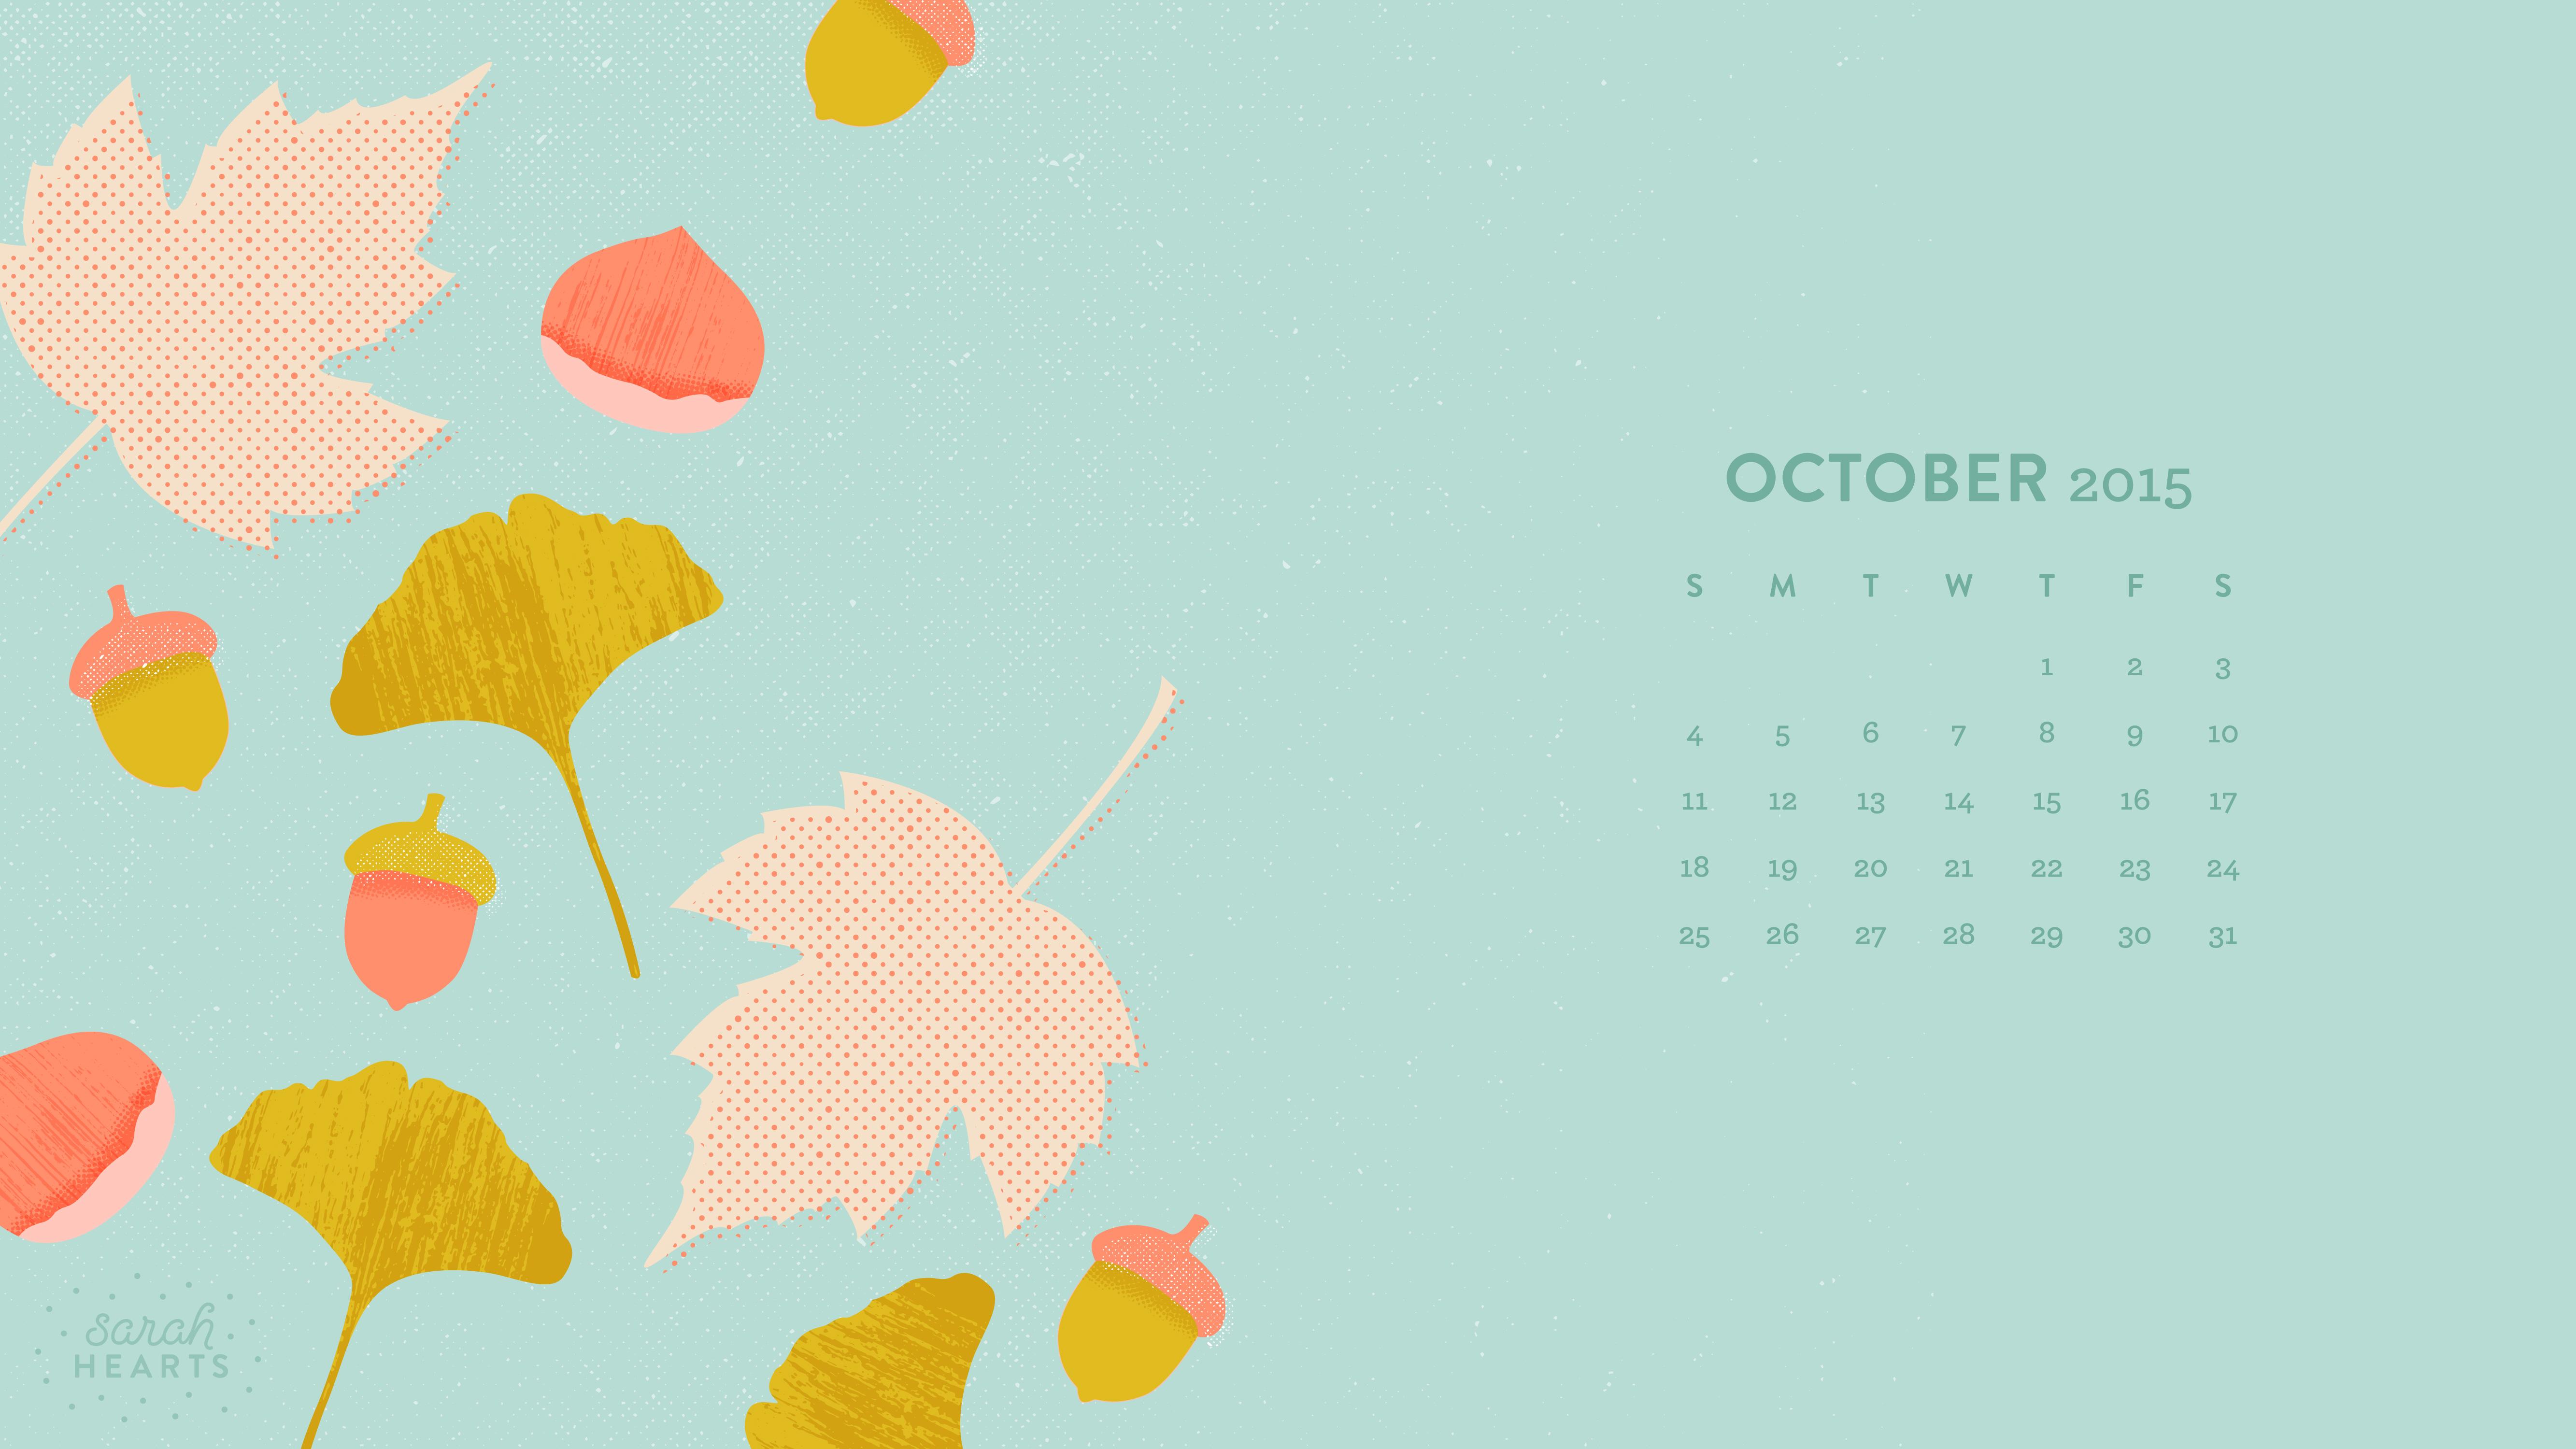 March 2018 Cute Full Screen Desktop Wallpapers October 2015 Calendar Wallpaper Sarah Hearts